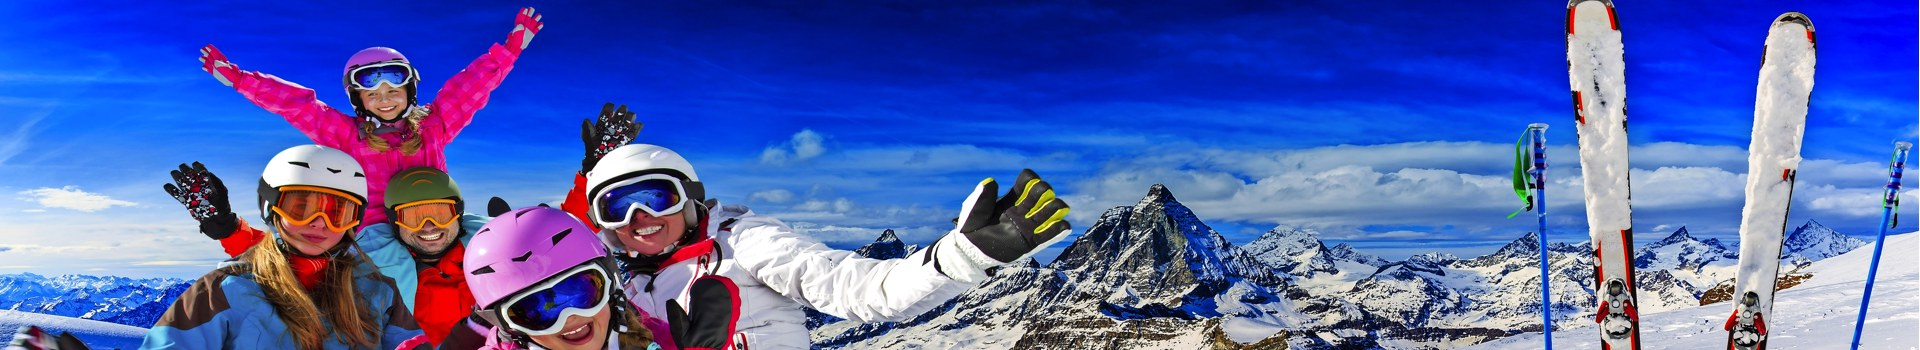 Schnabel | Ski